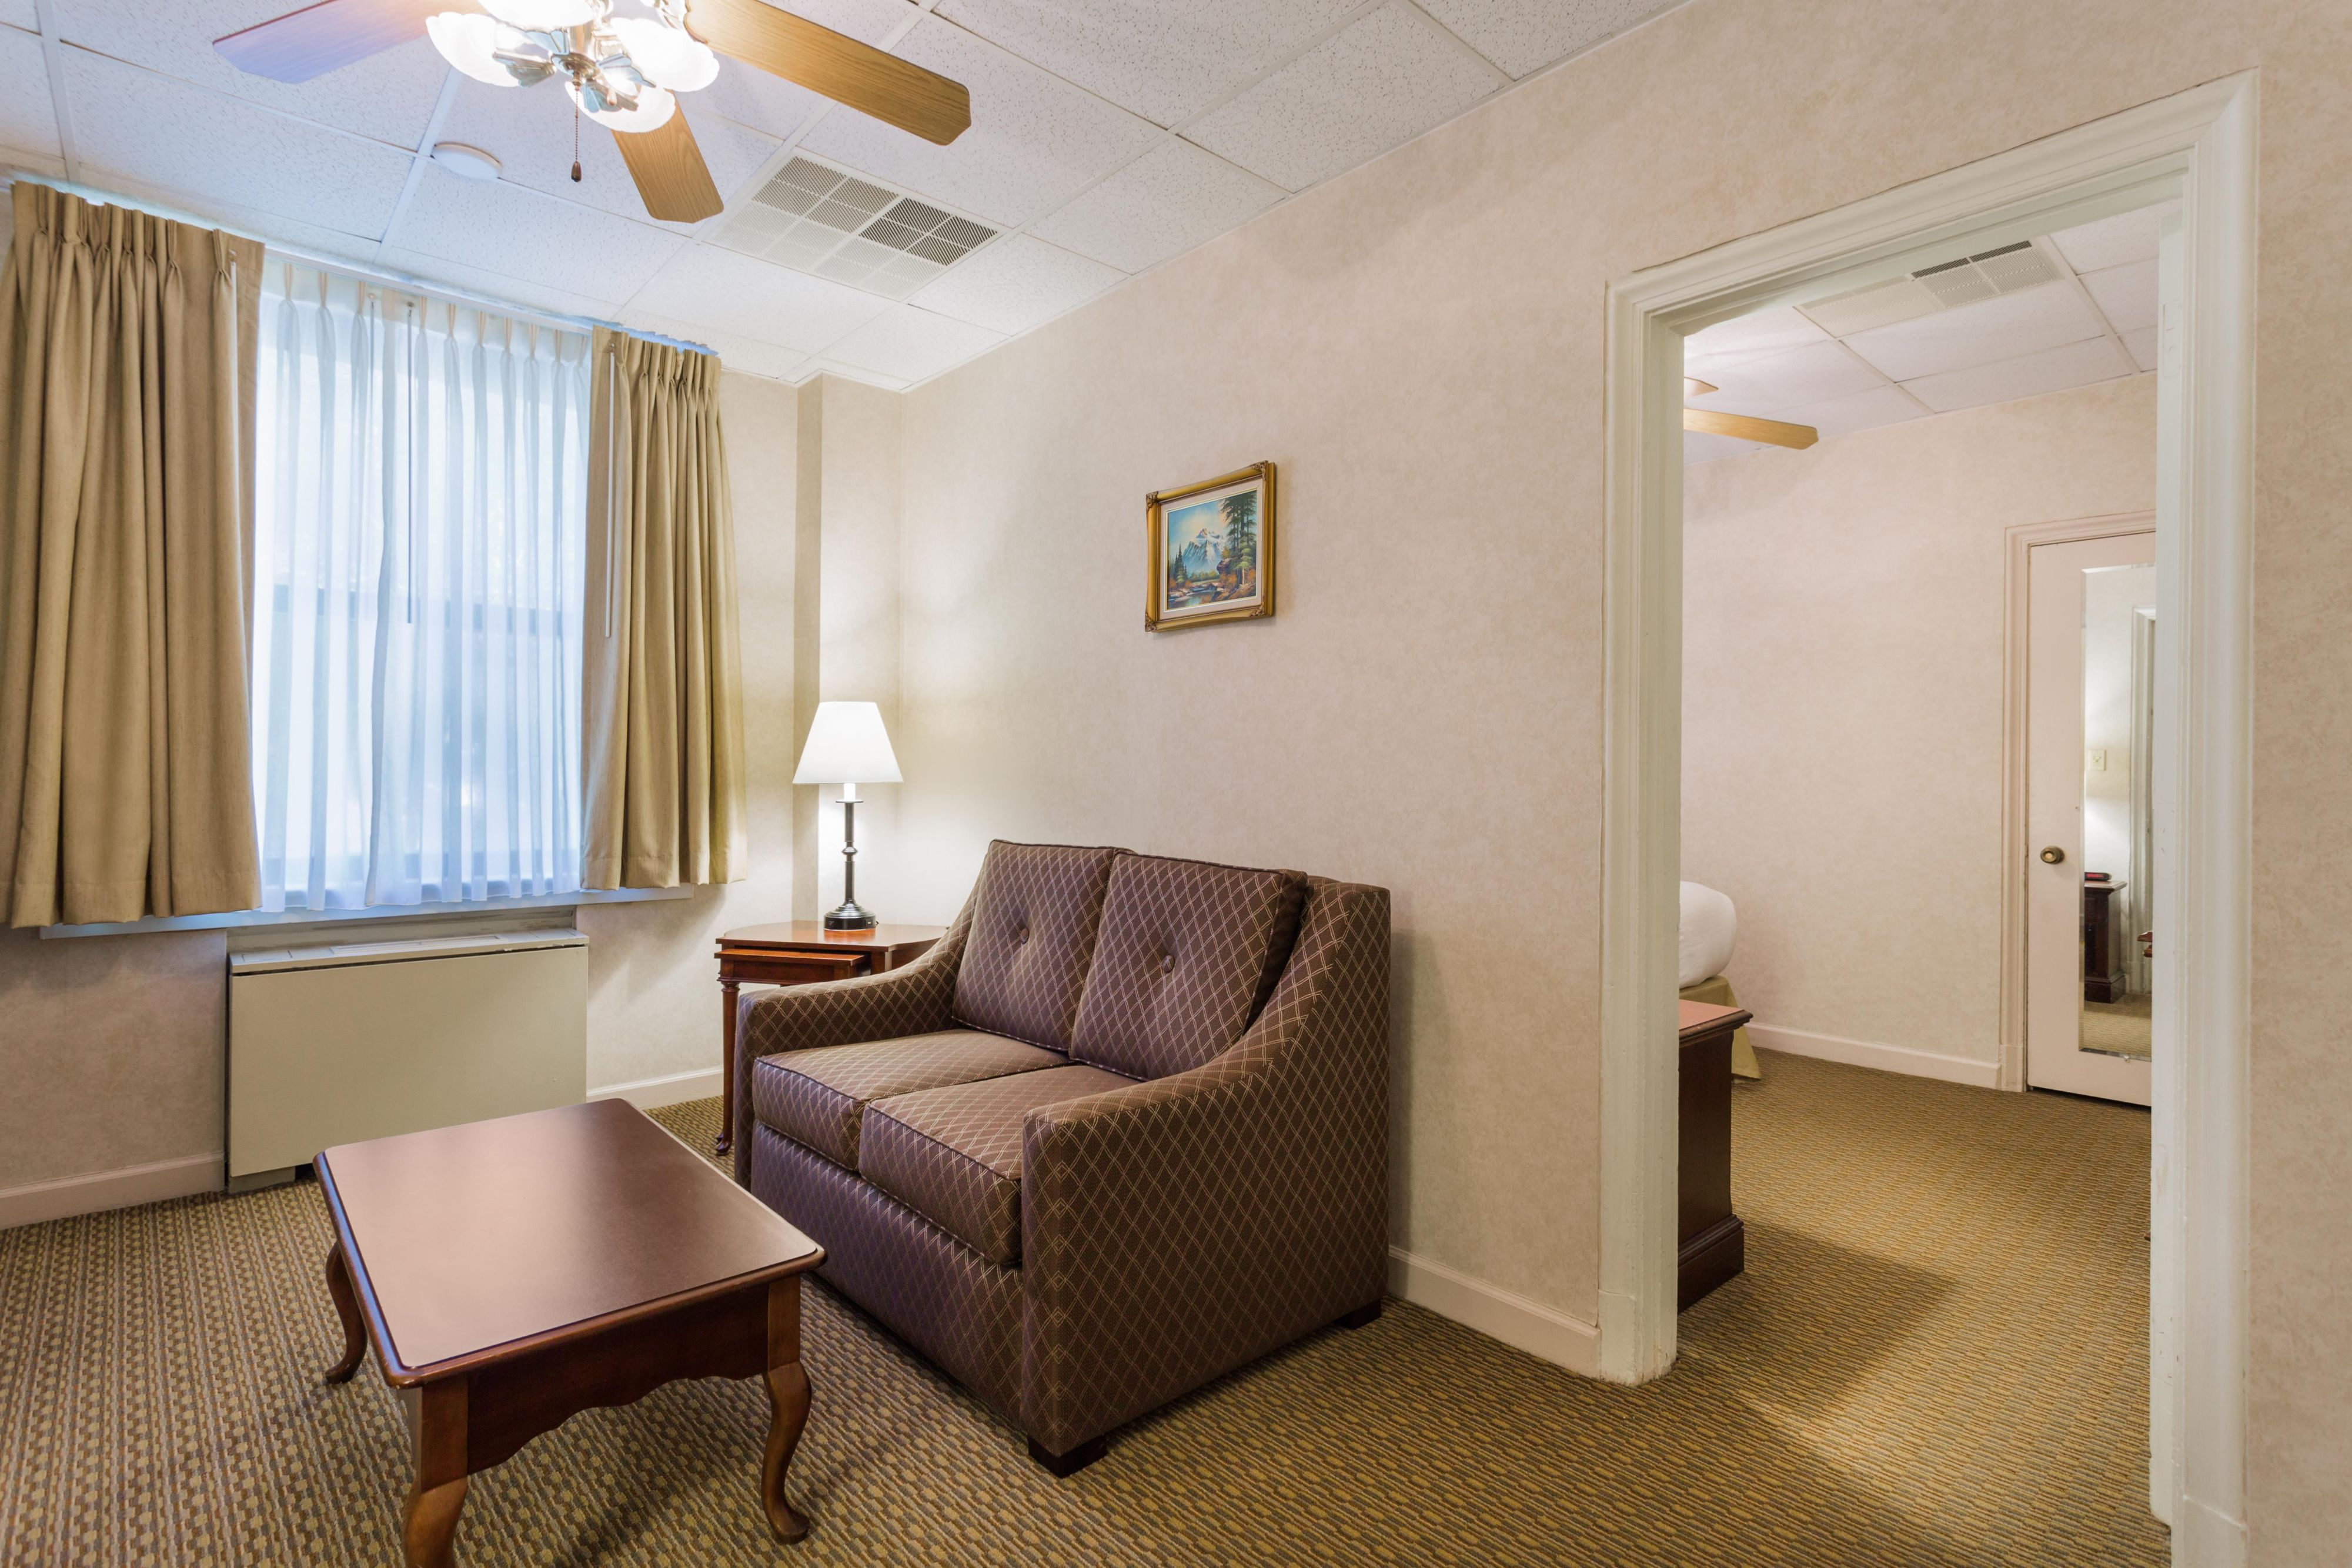 Ihg Army Hotels Normandy House Carolina Inn Hotel By Ihg